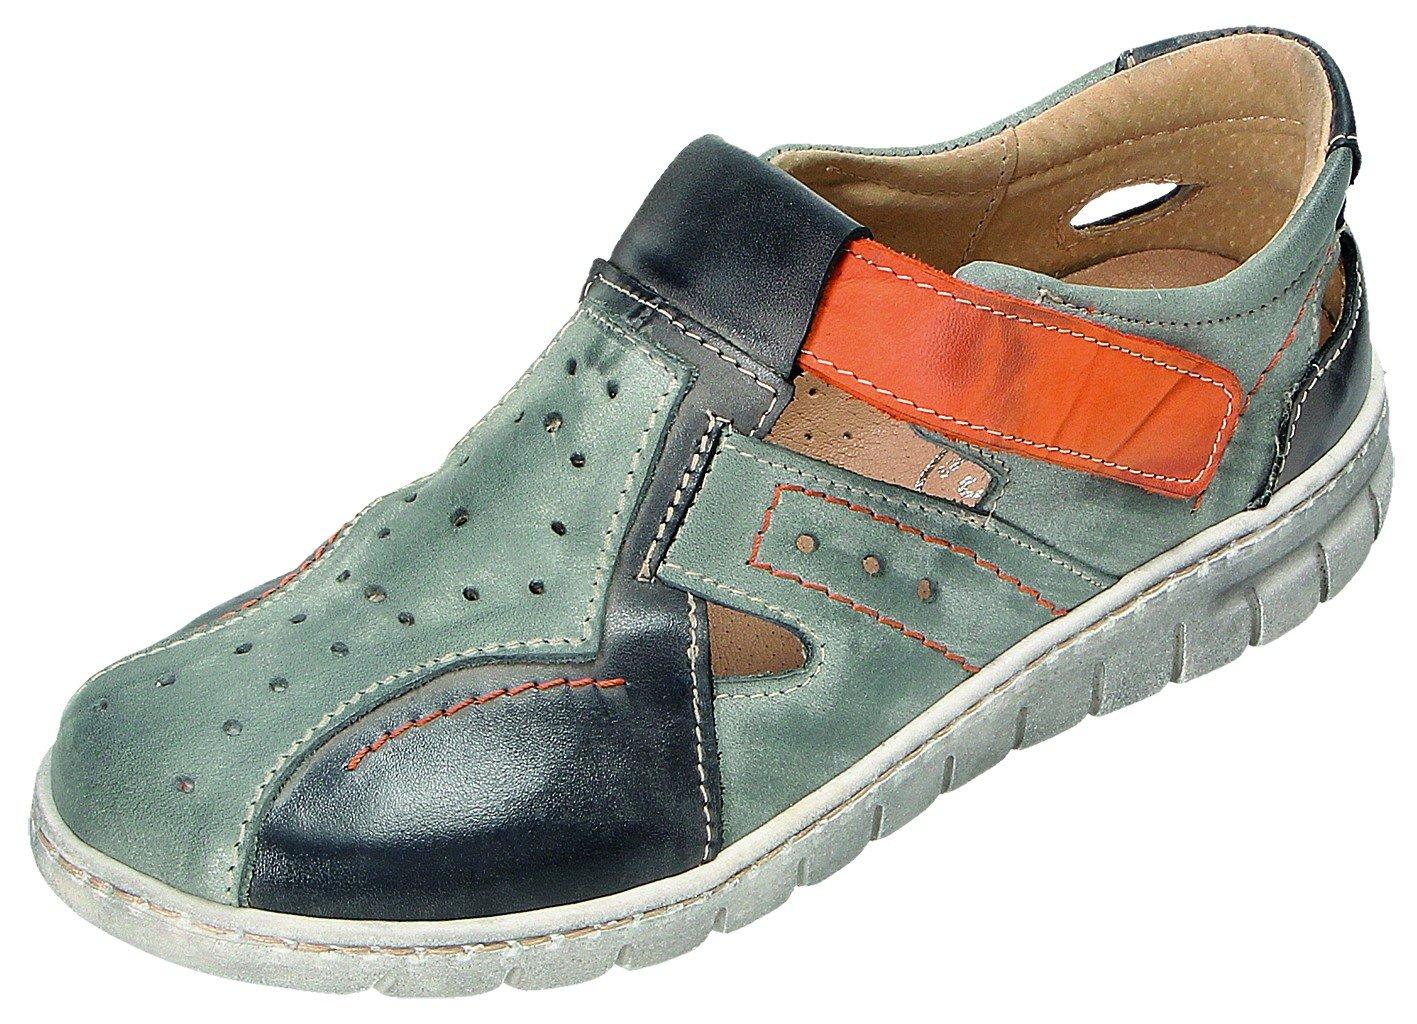 MICCOS Zapatos de Cordones Para Mujer Gris blaugrau/Komb. 39 EU|blaugrau/komb.